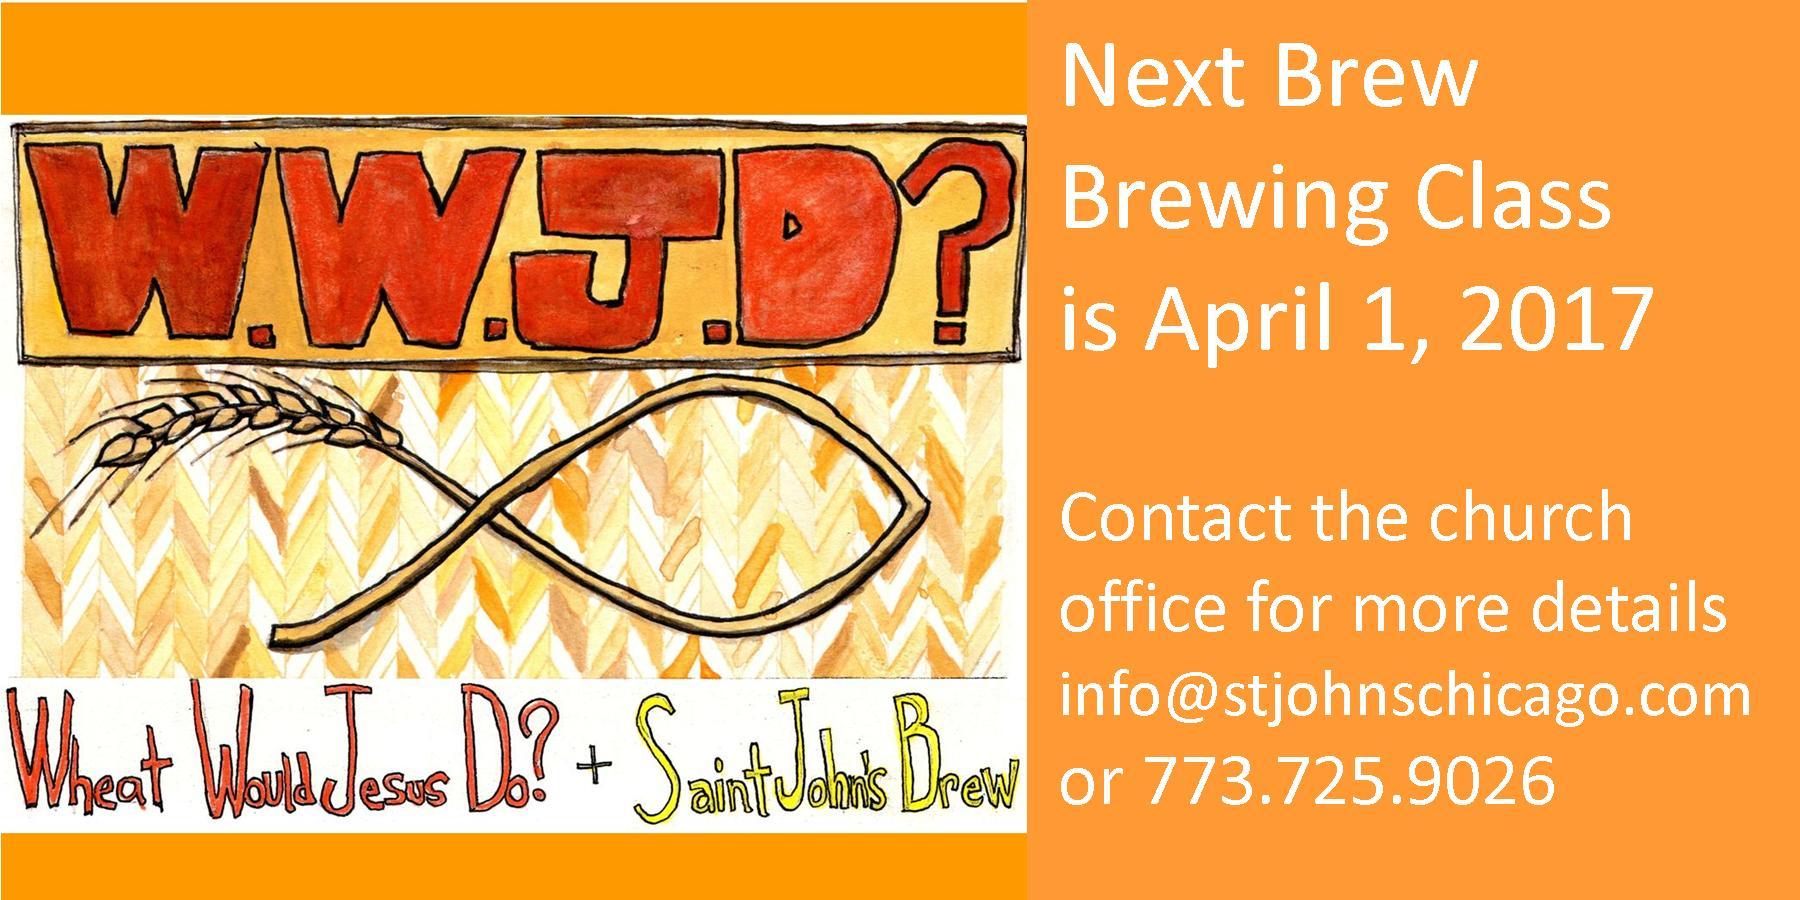 St. John's Brewery Presents